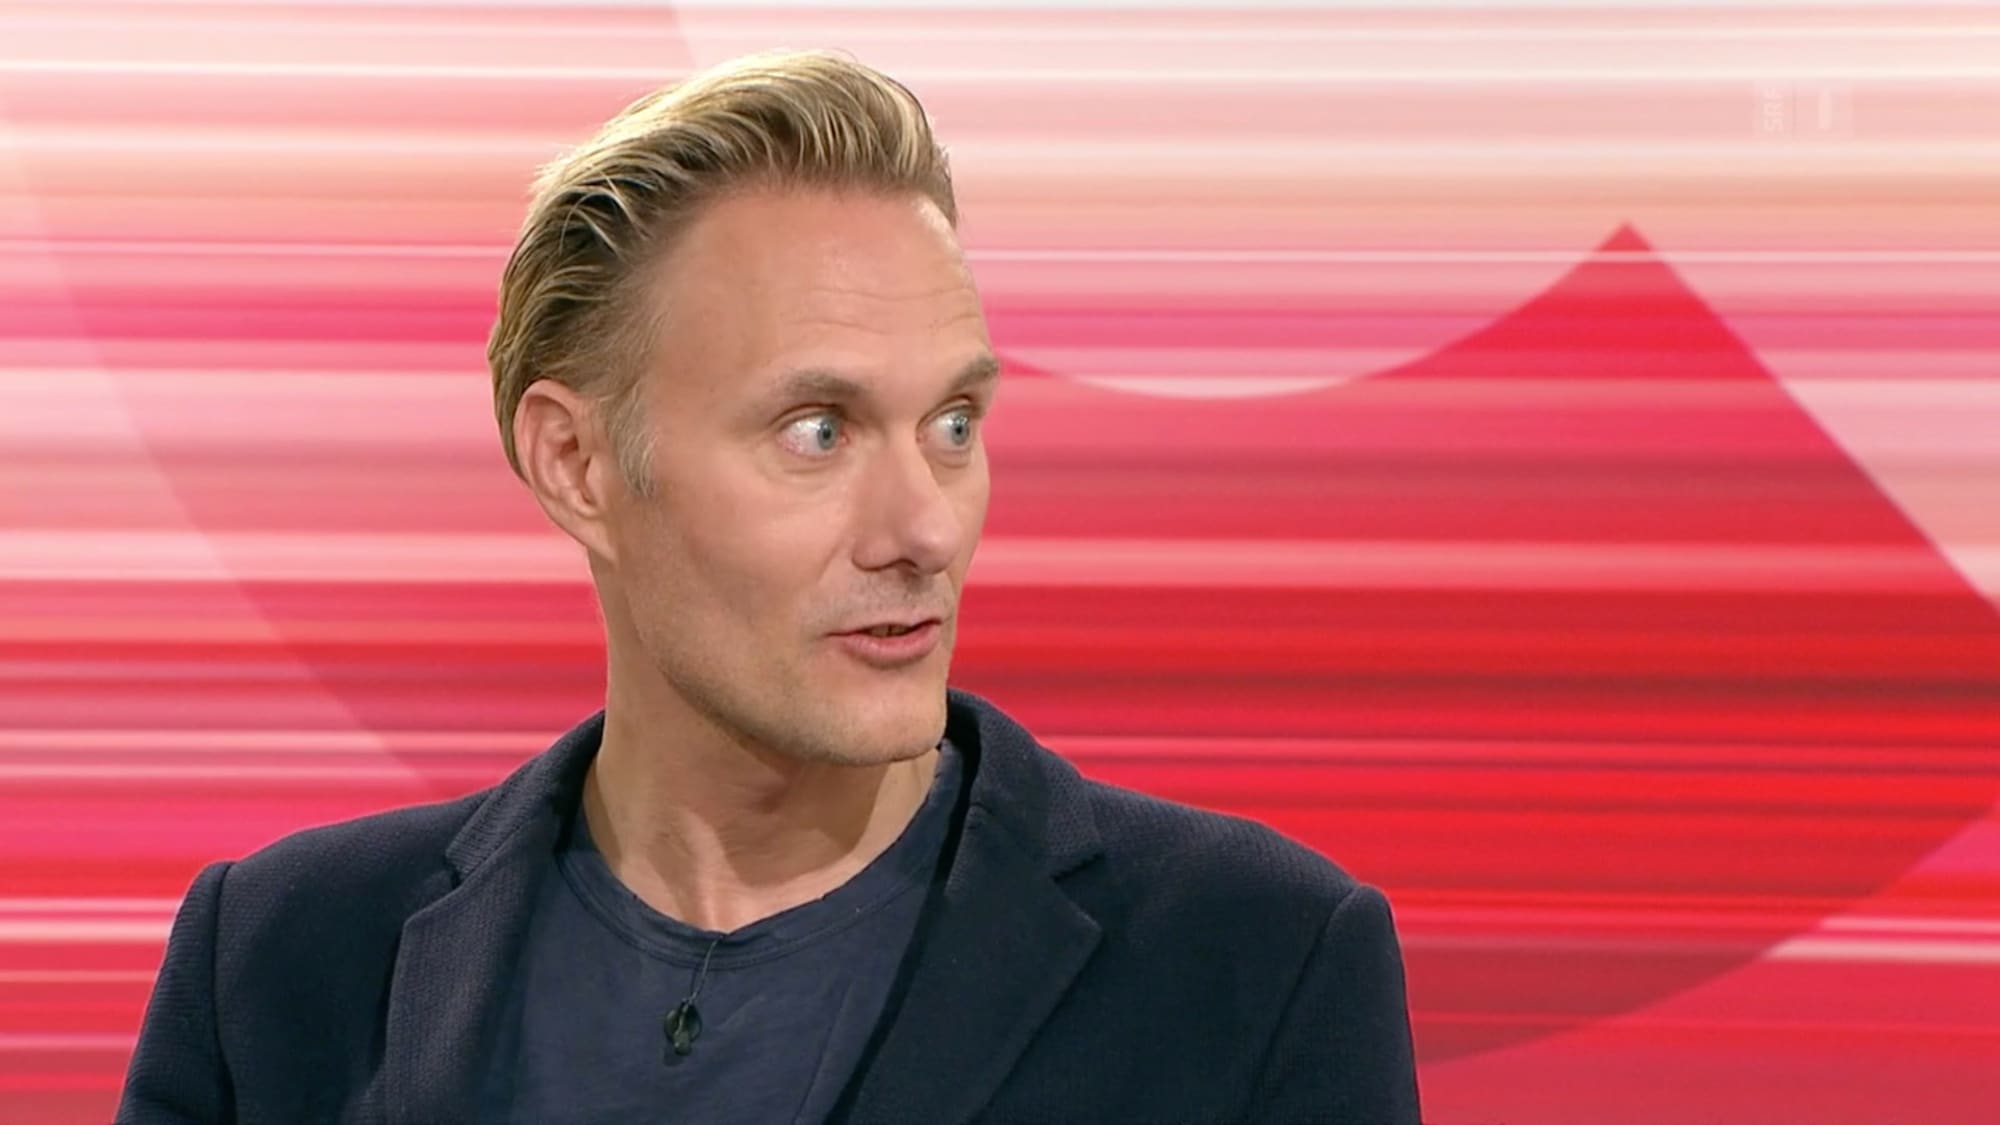 Verhandlungsgespräche nähren Gerüchte über TV-Sender 3+: Kaiser, ledig, sucht Partner